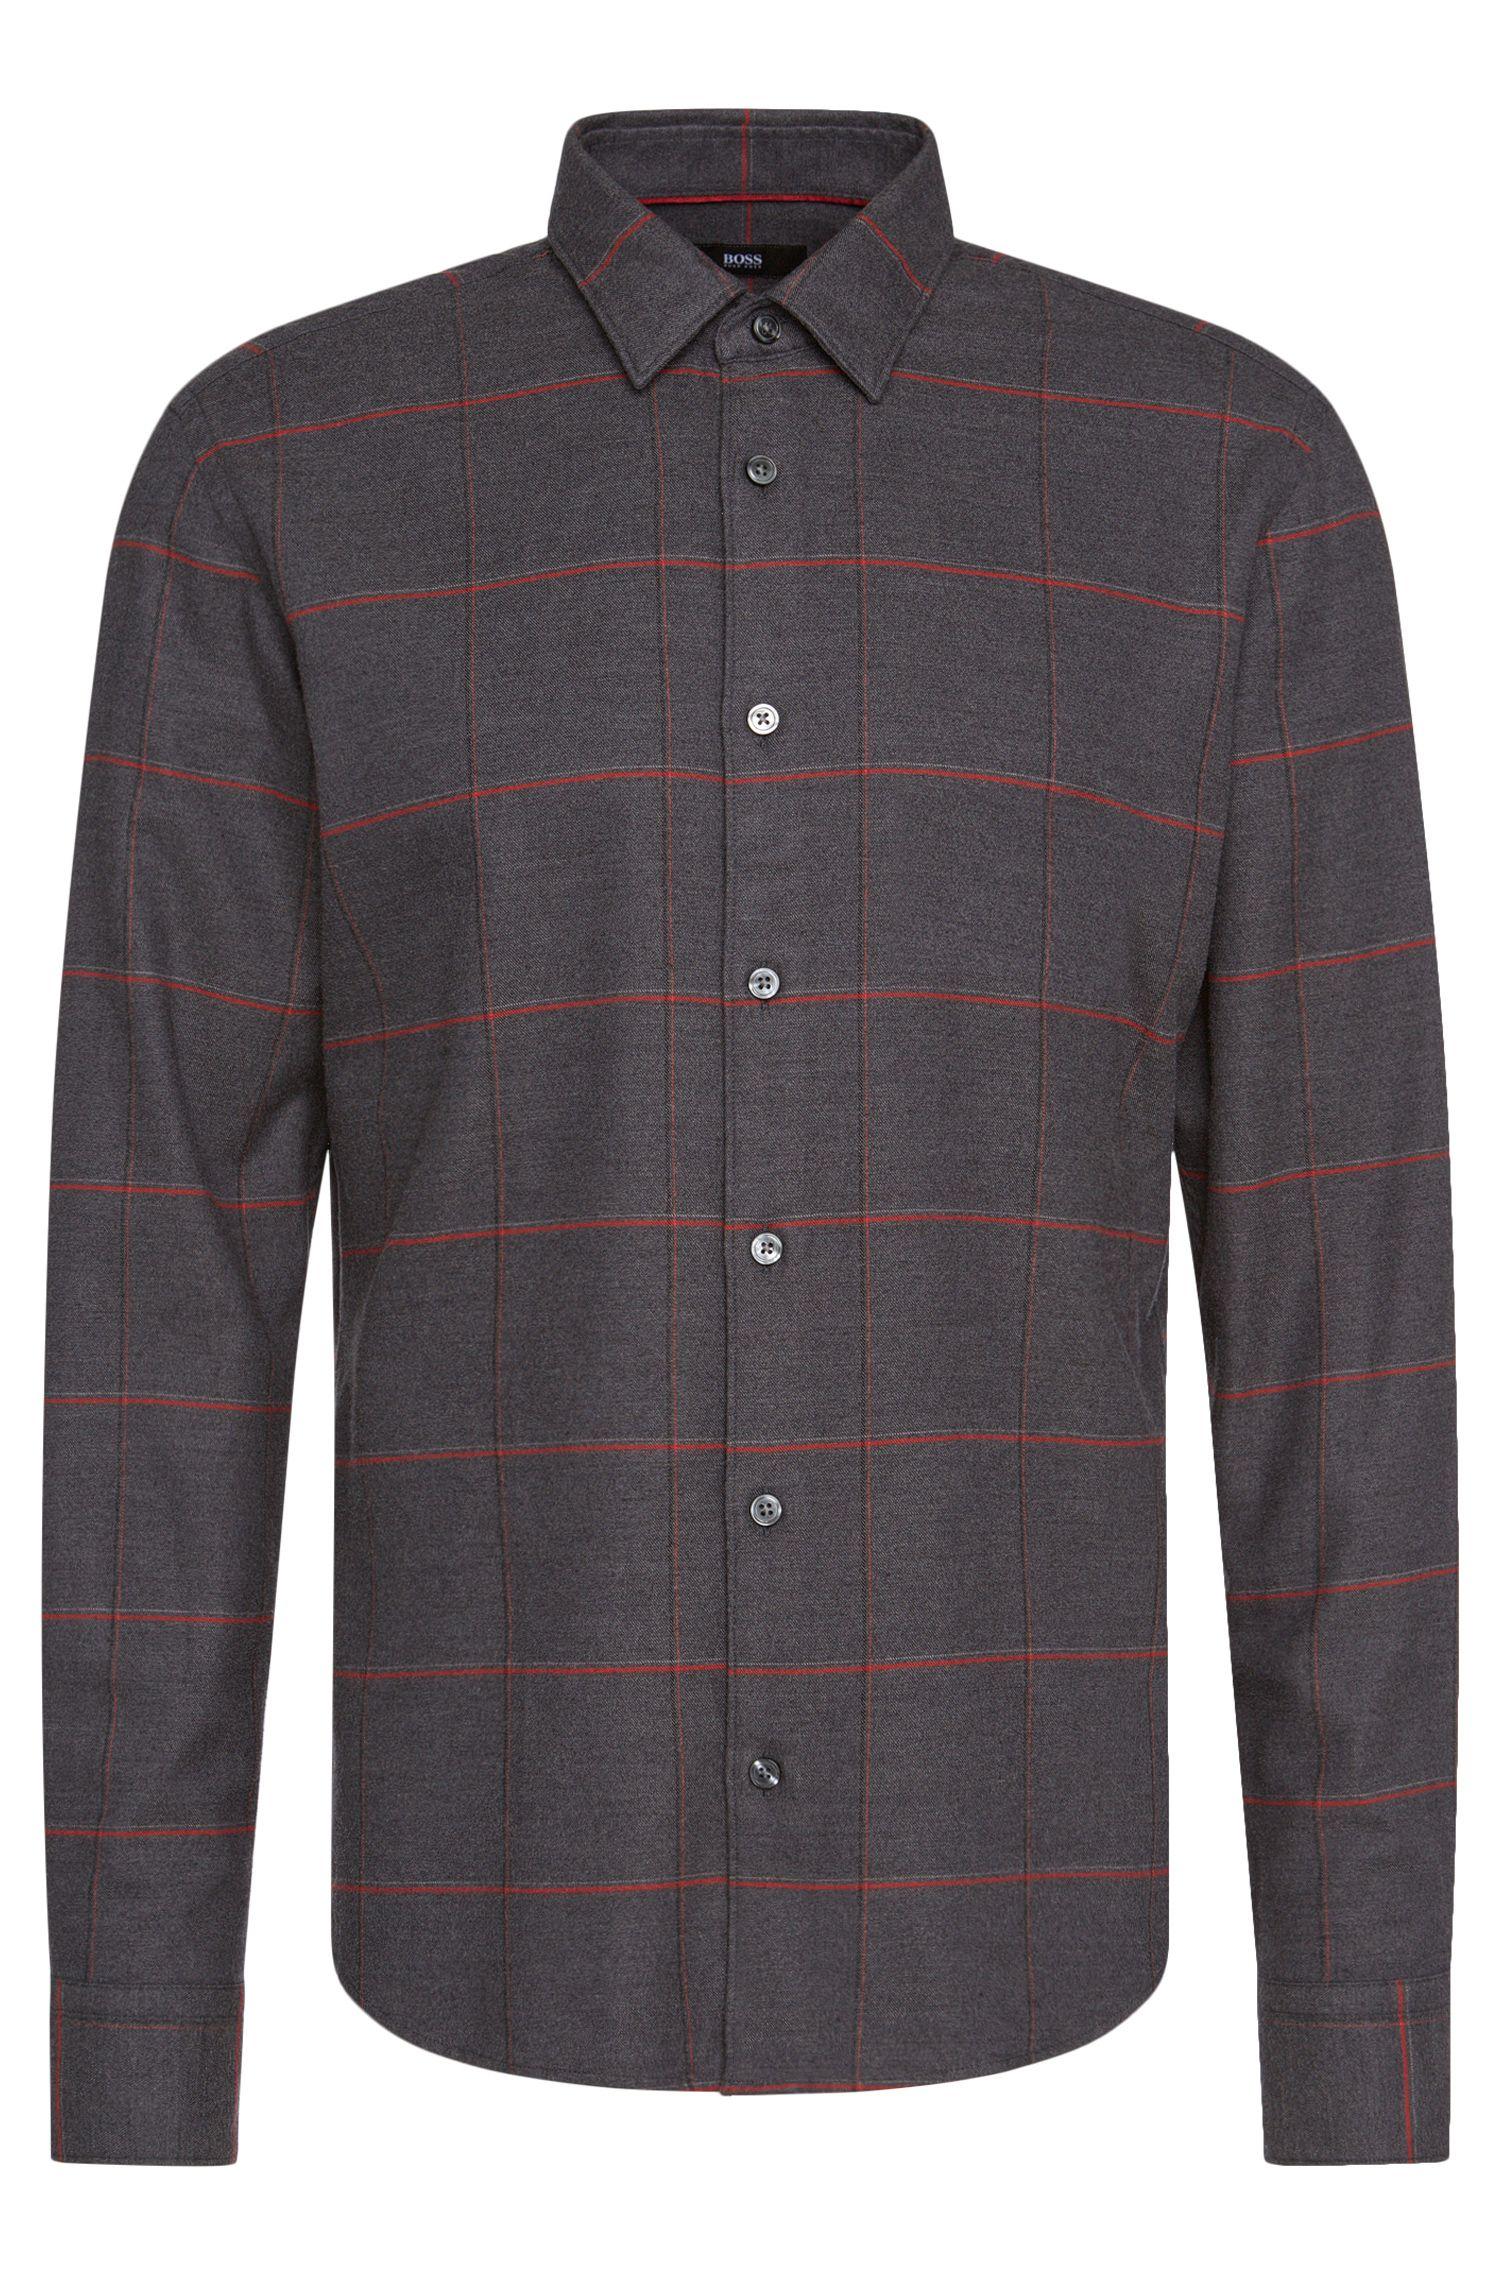 'Reid F'   Slim Fit, Cotton Lyocell Button Down Shirt